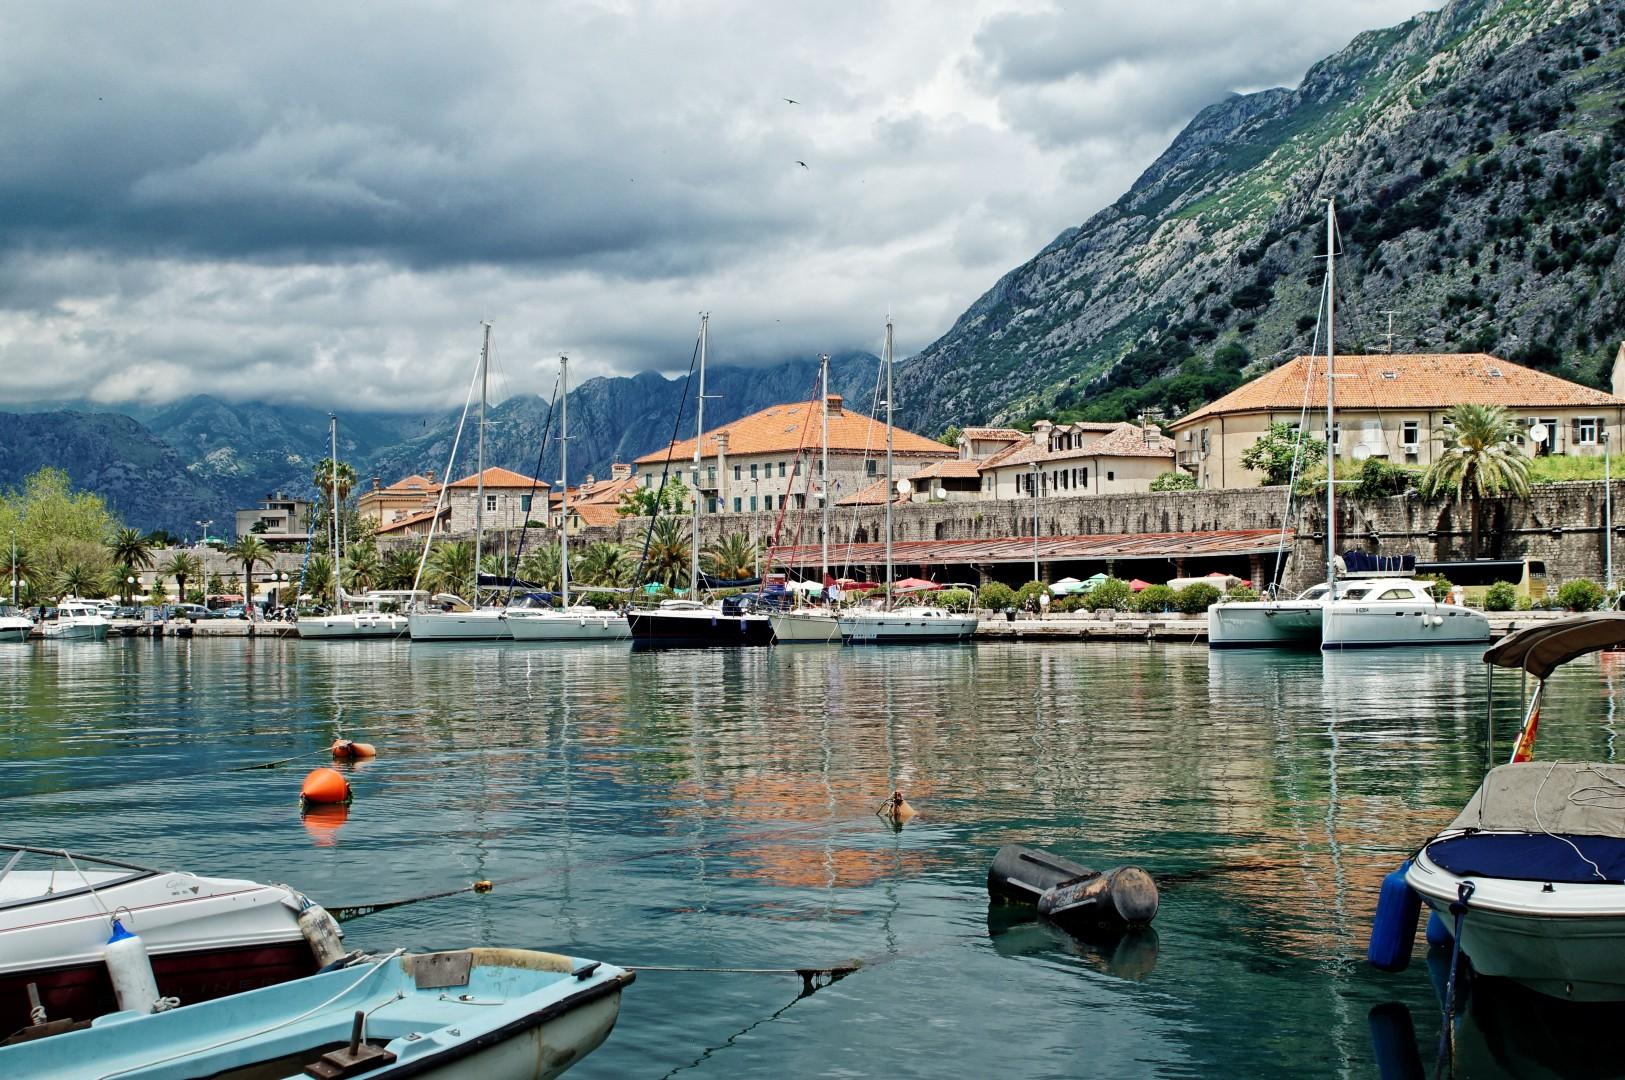 stare miasto w Kotorze